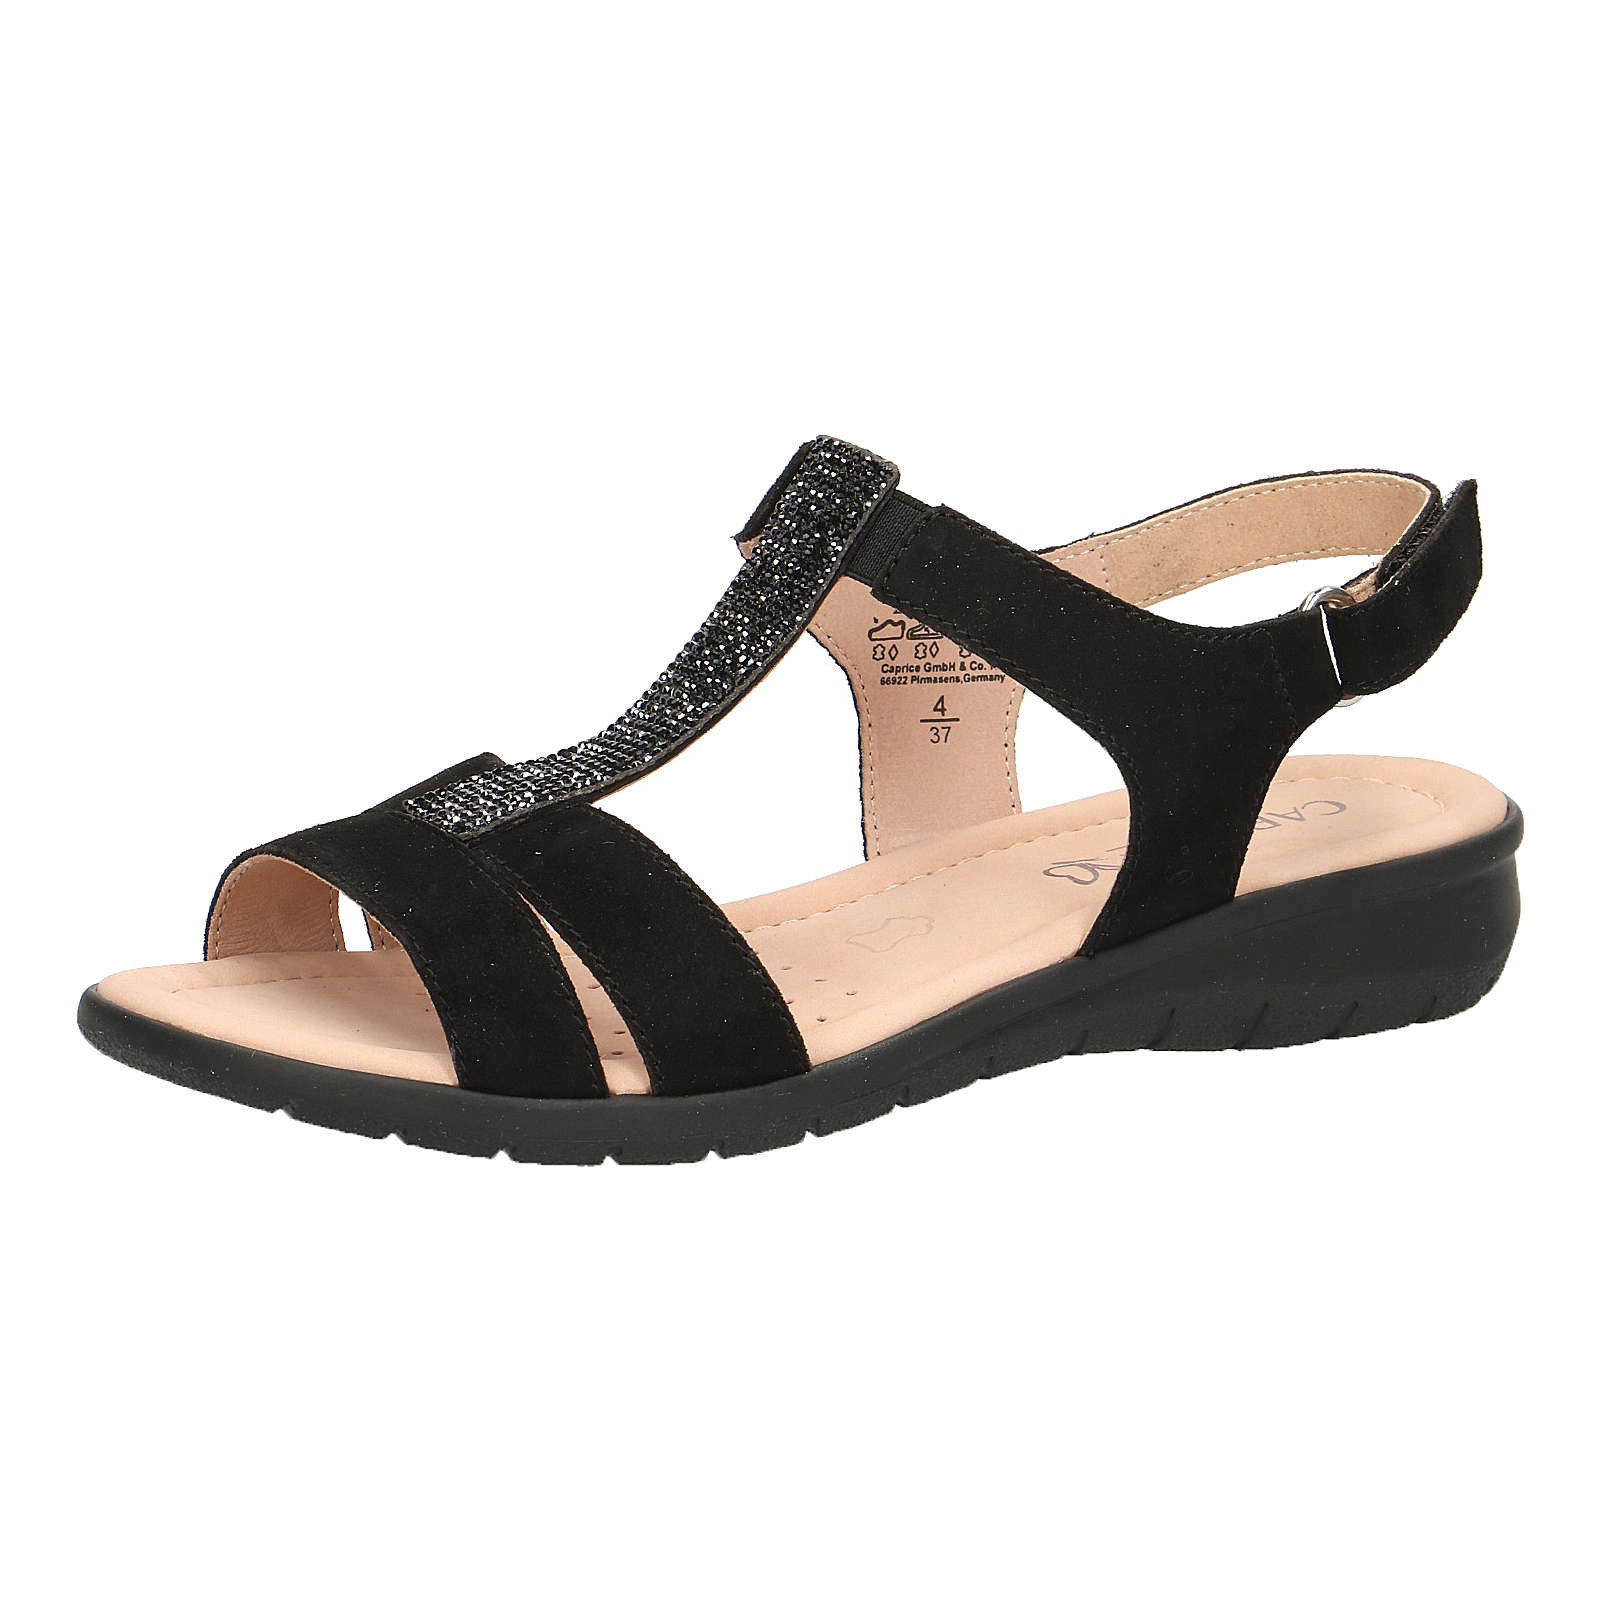 CAPRICE T-Steg-Sandalen schwarz Damen Gr. 36